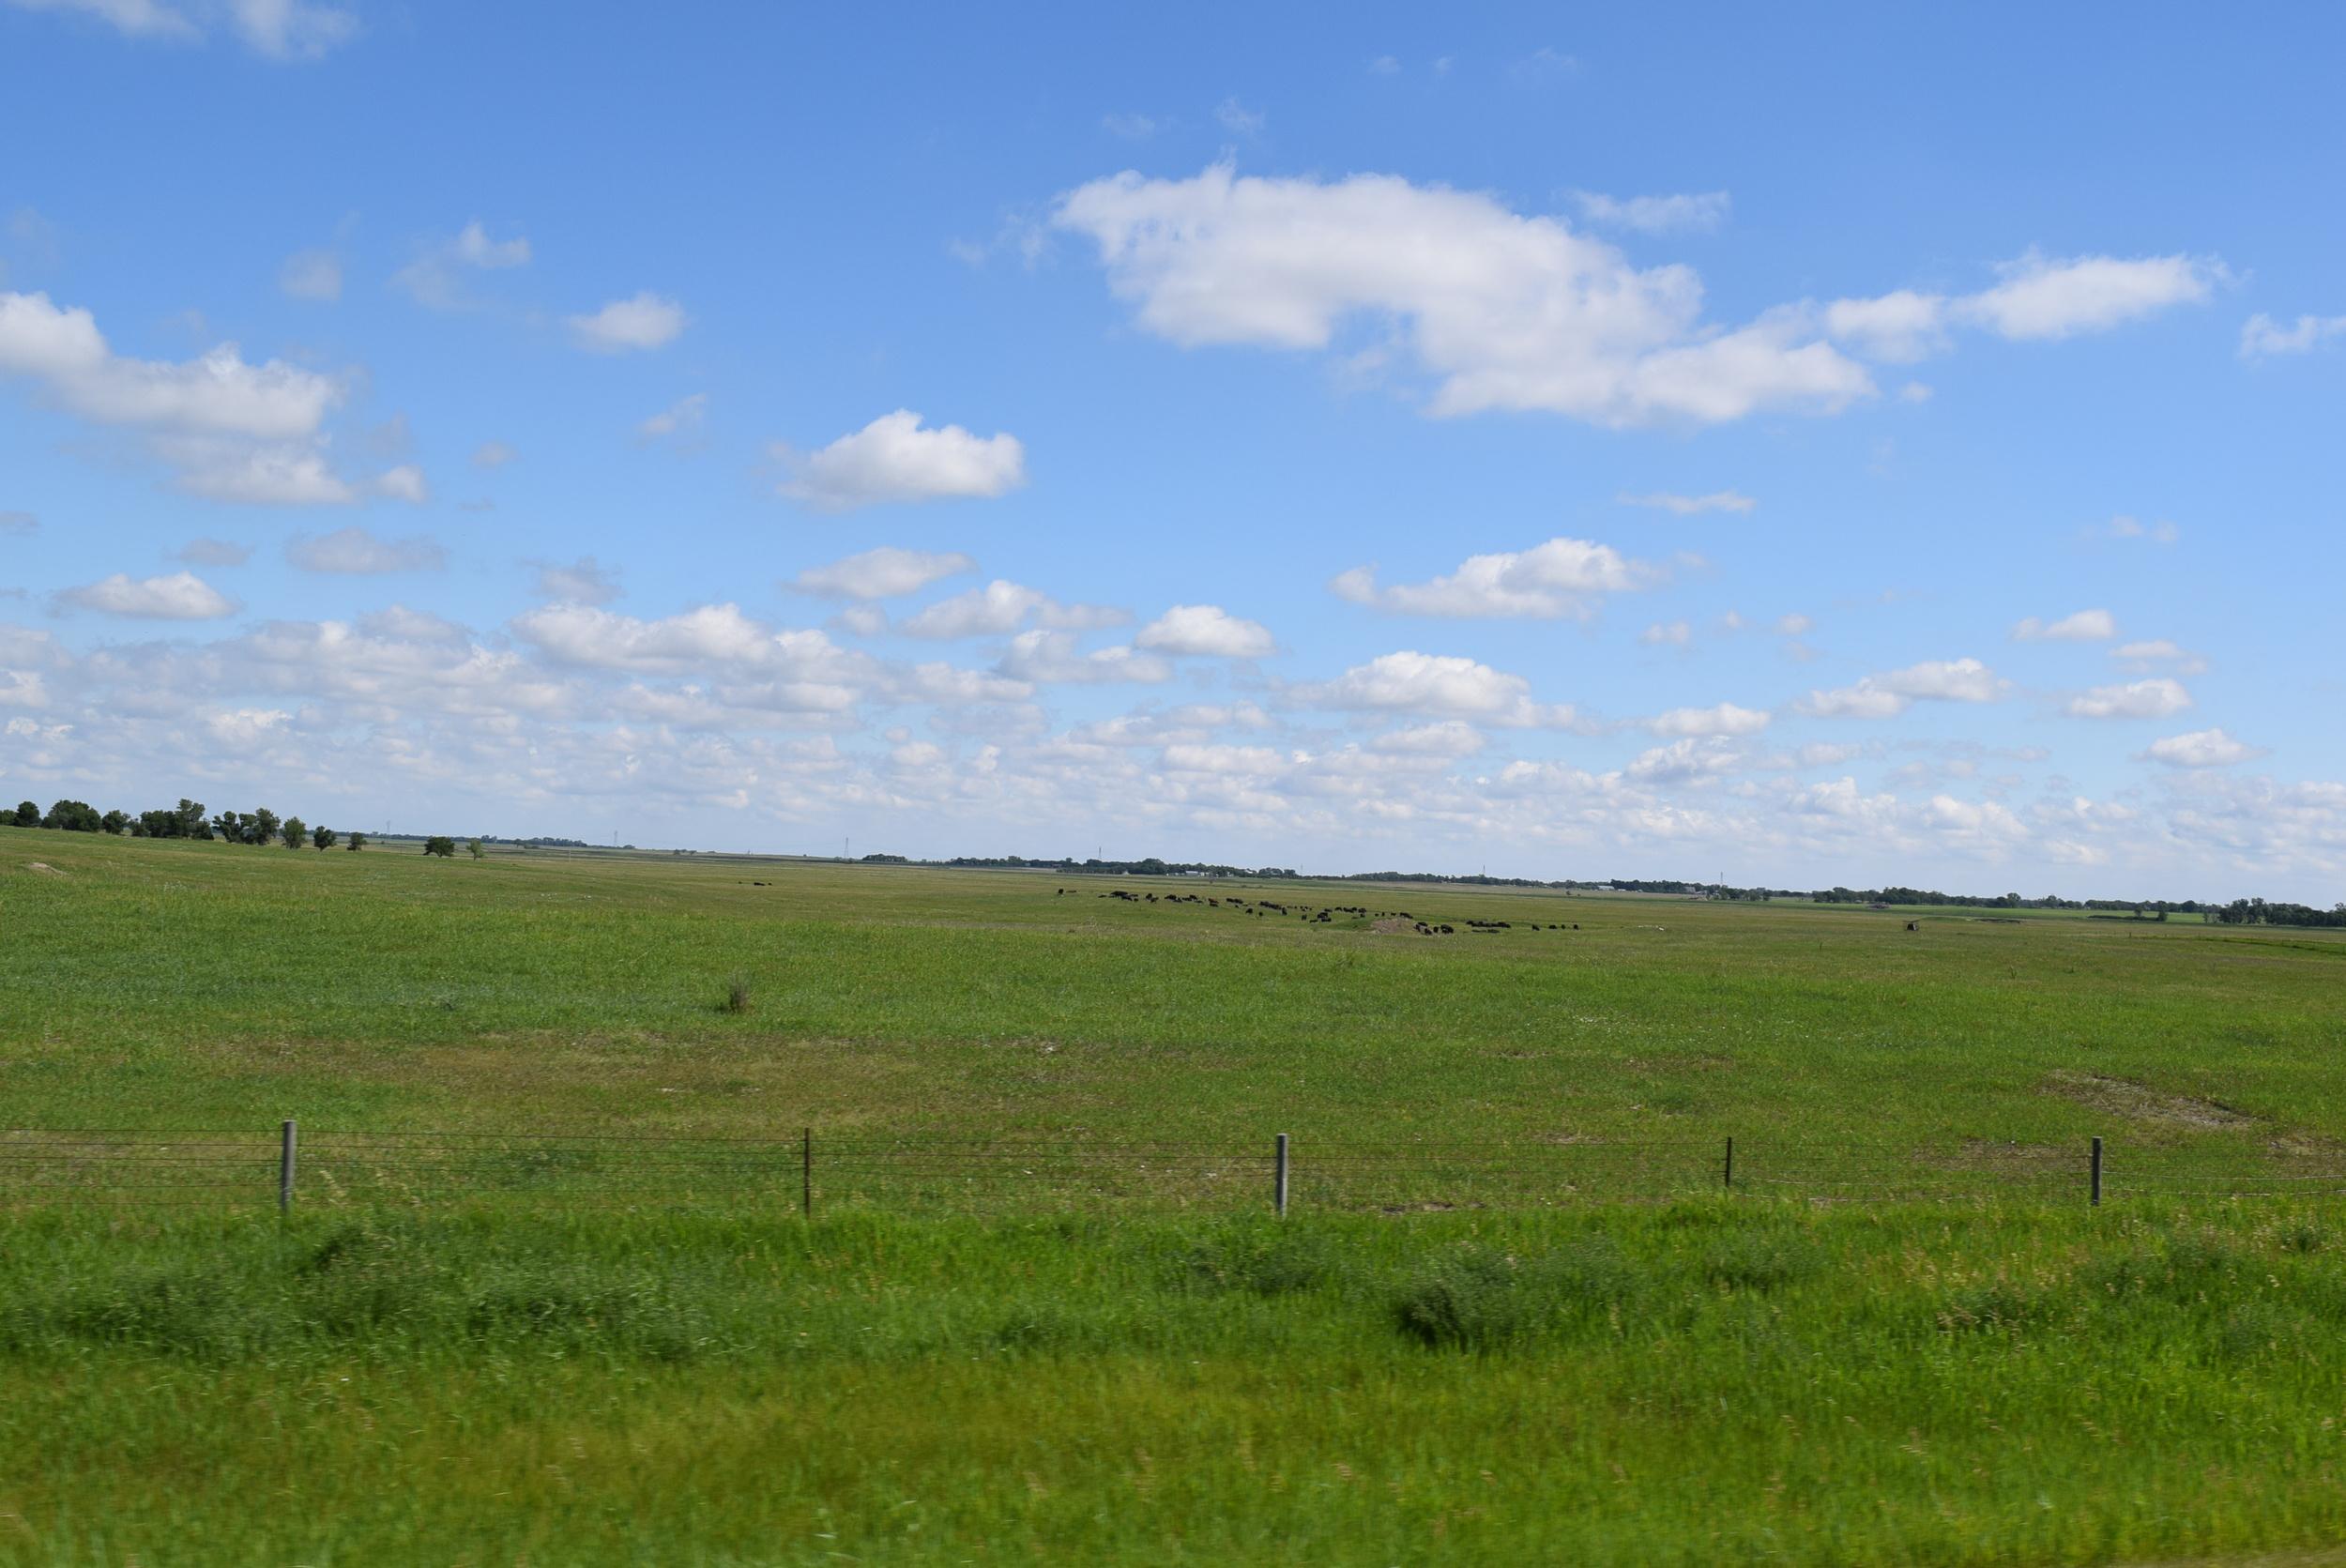 The South Dakota prairie.